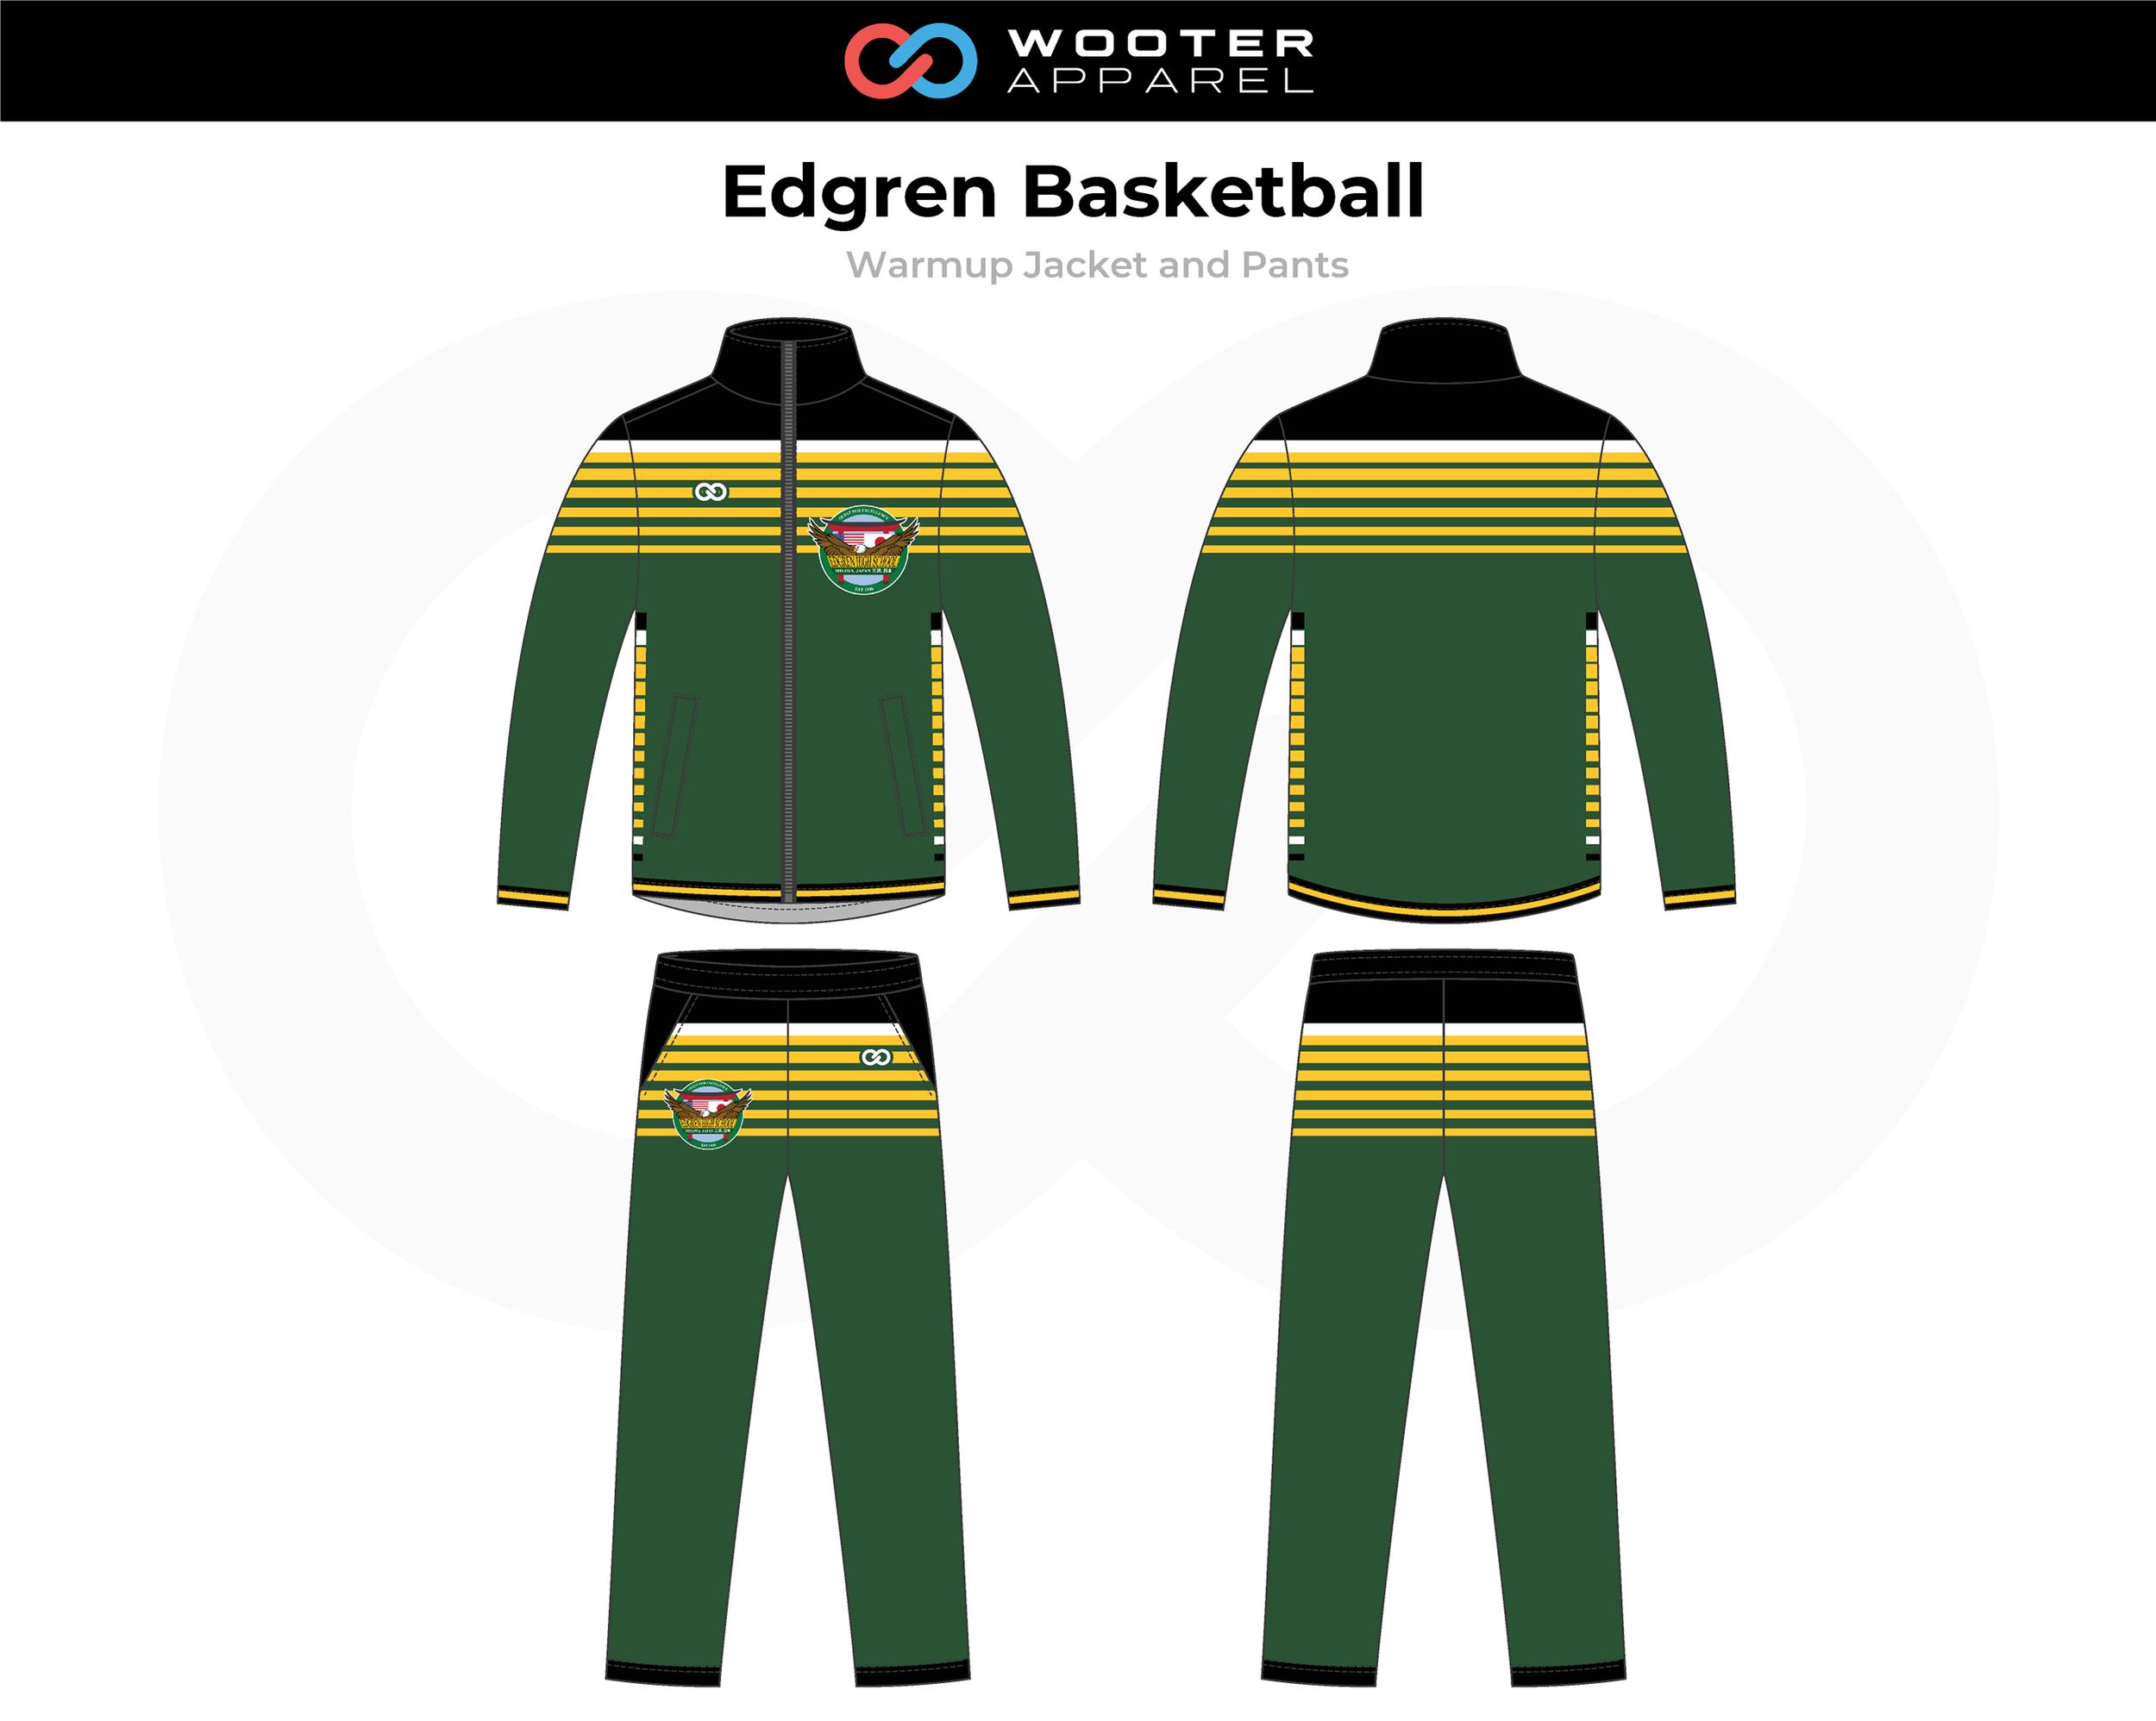 EDGREN Green Black Yellow Basketball Warmup Jacket and Pants